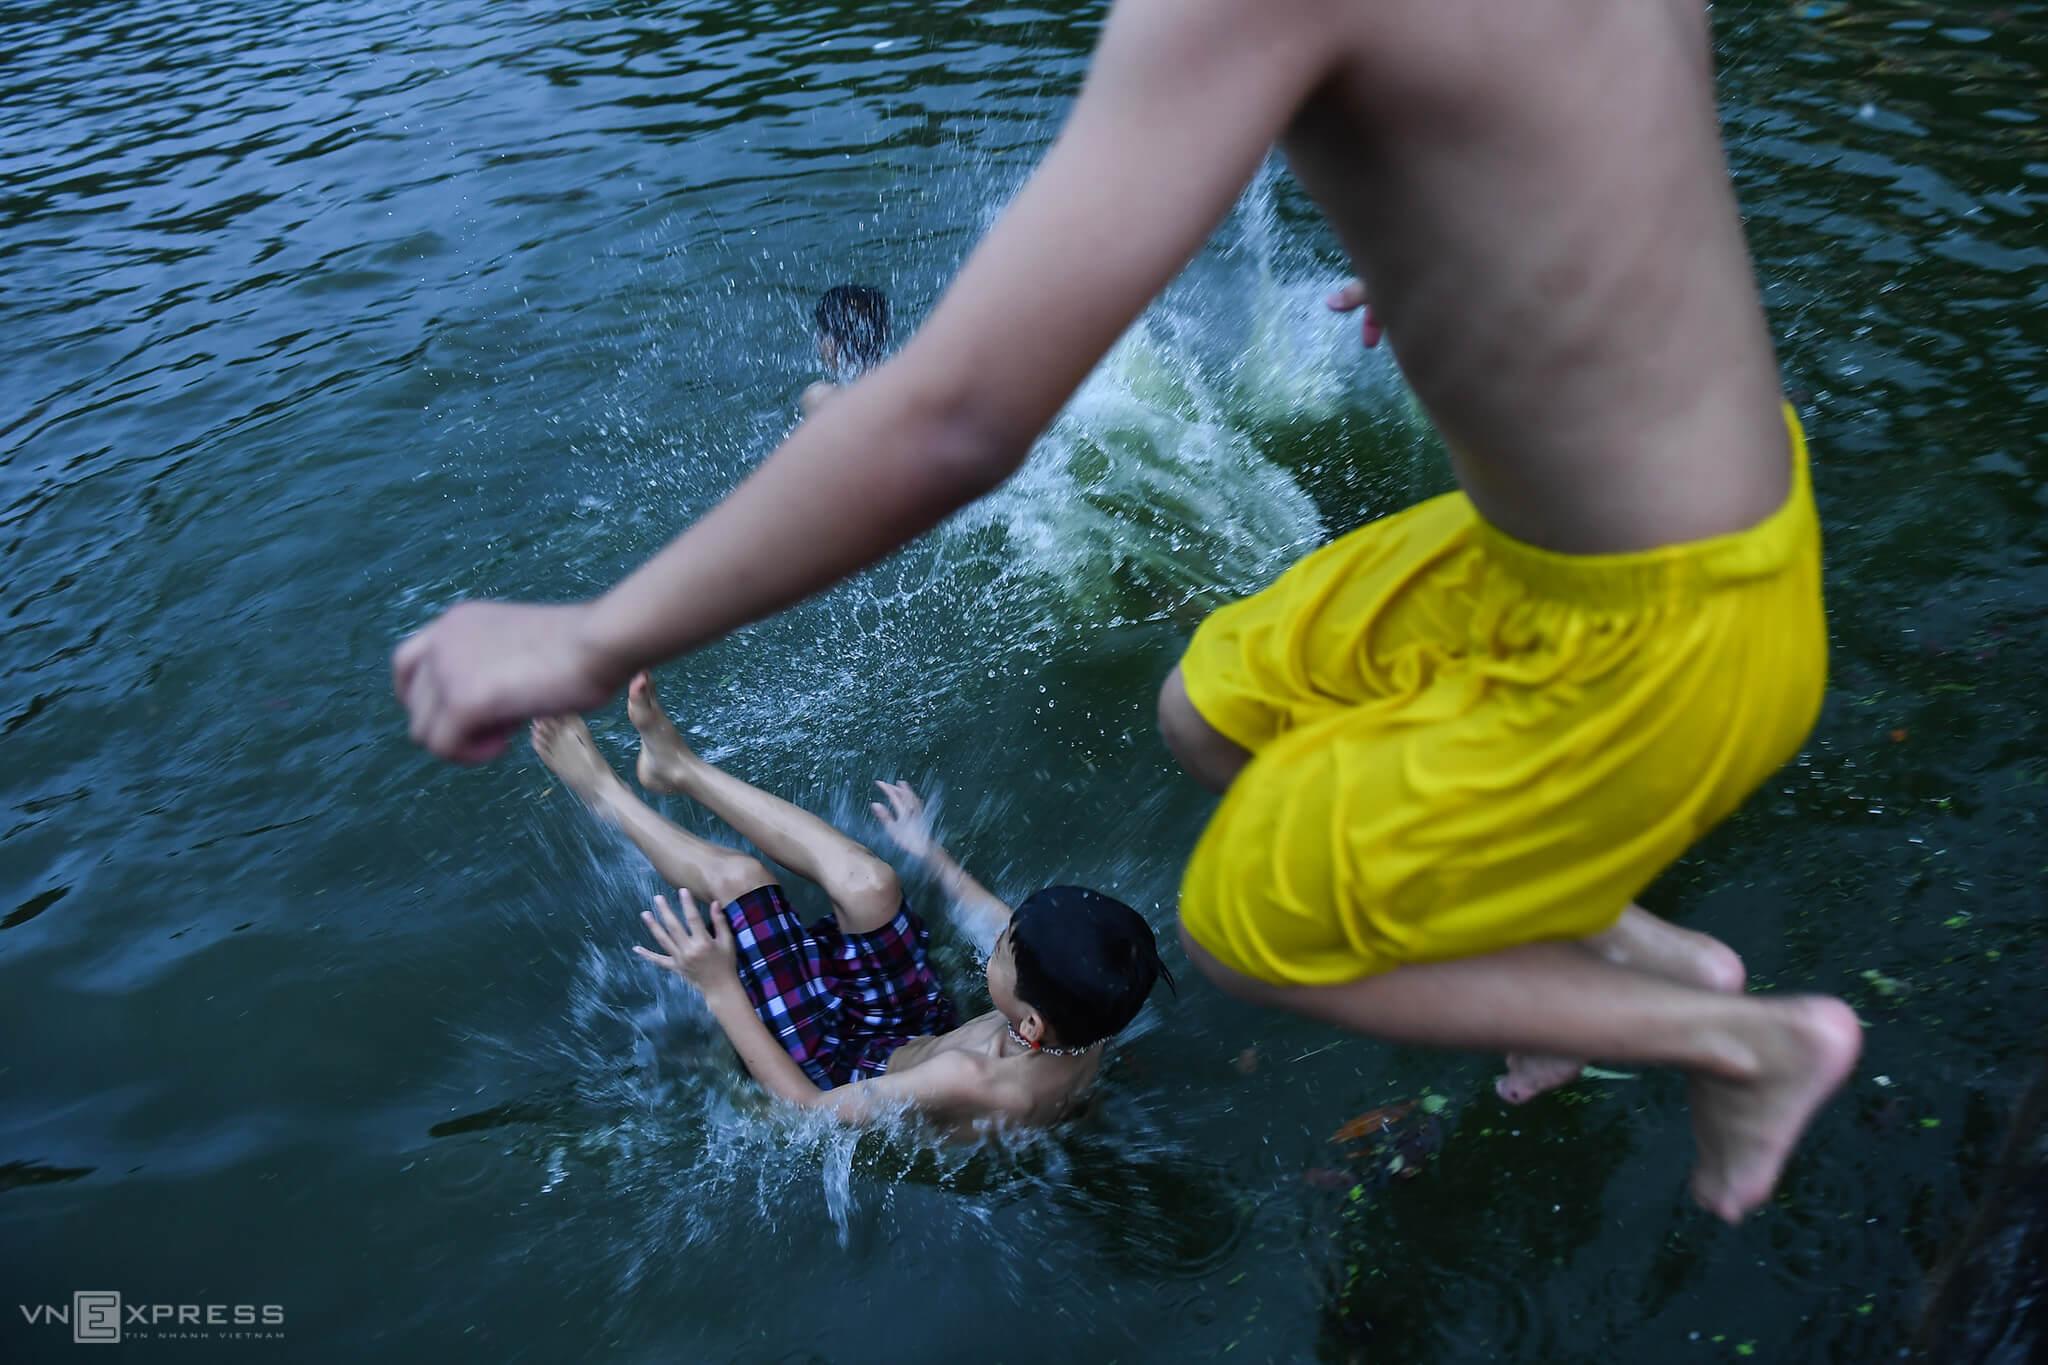 Lakes provide Hanoi youth respite from scalding heat